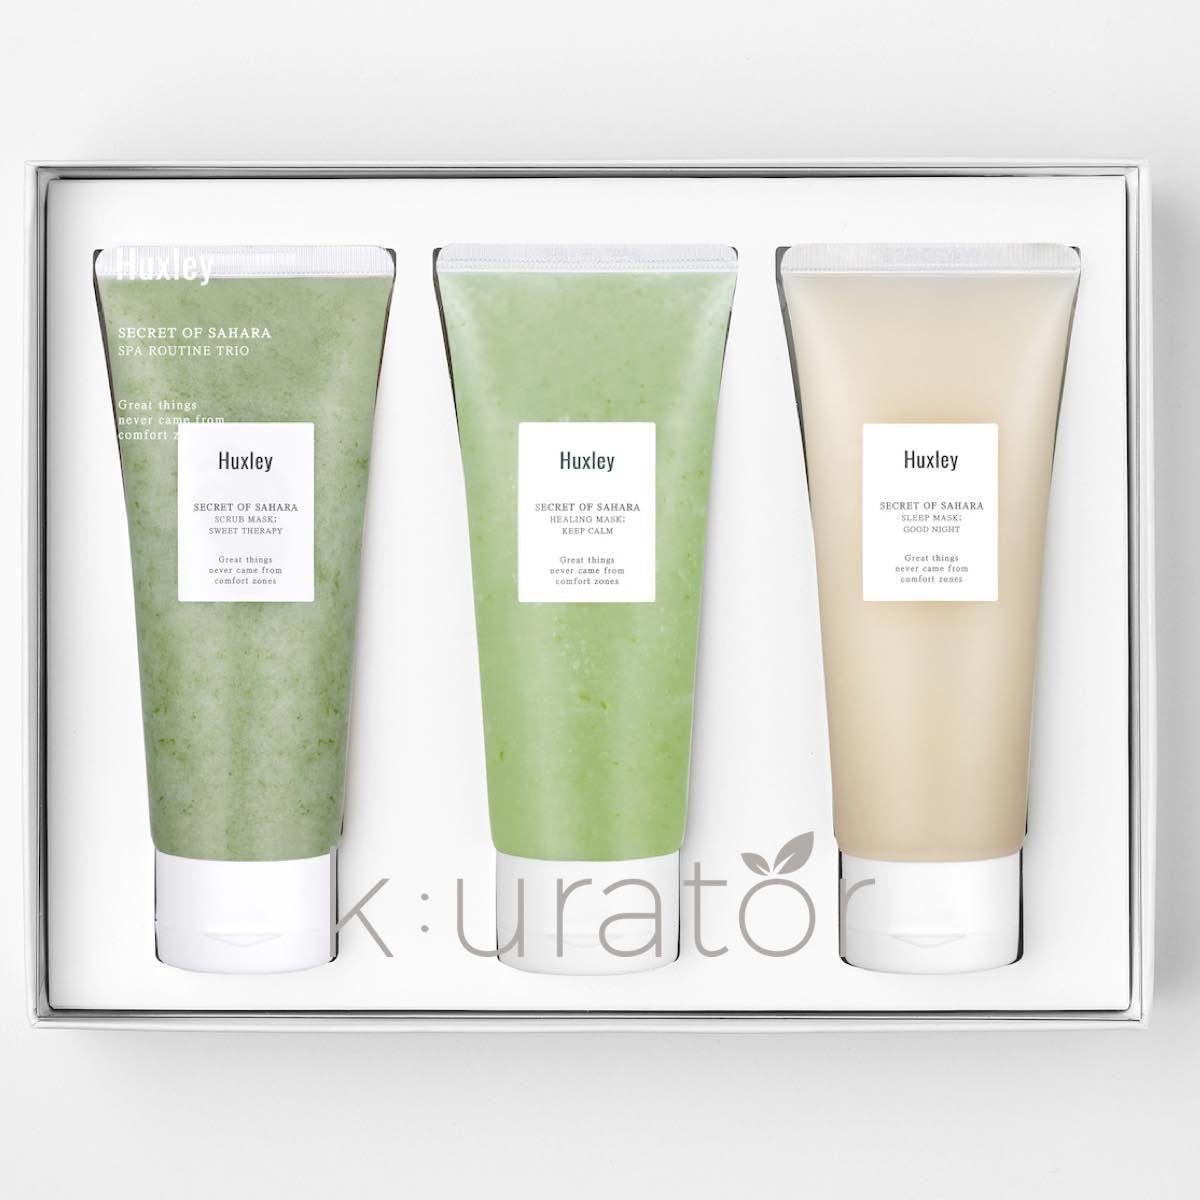 Huxley Kurator My In 2020 Huxley Korean Beauty Skincare Trio